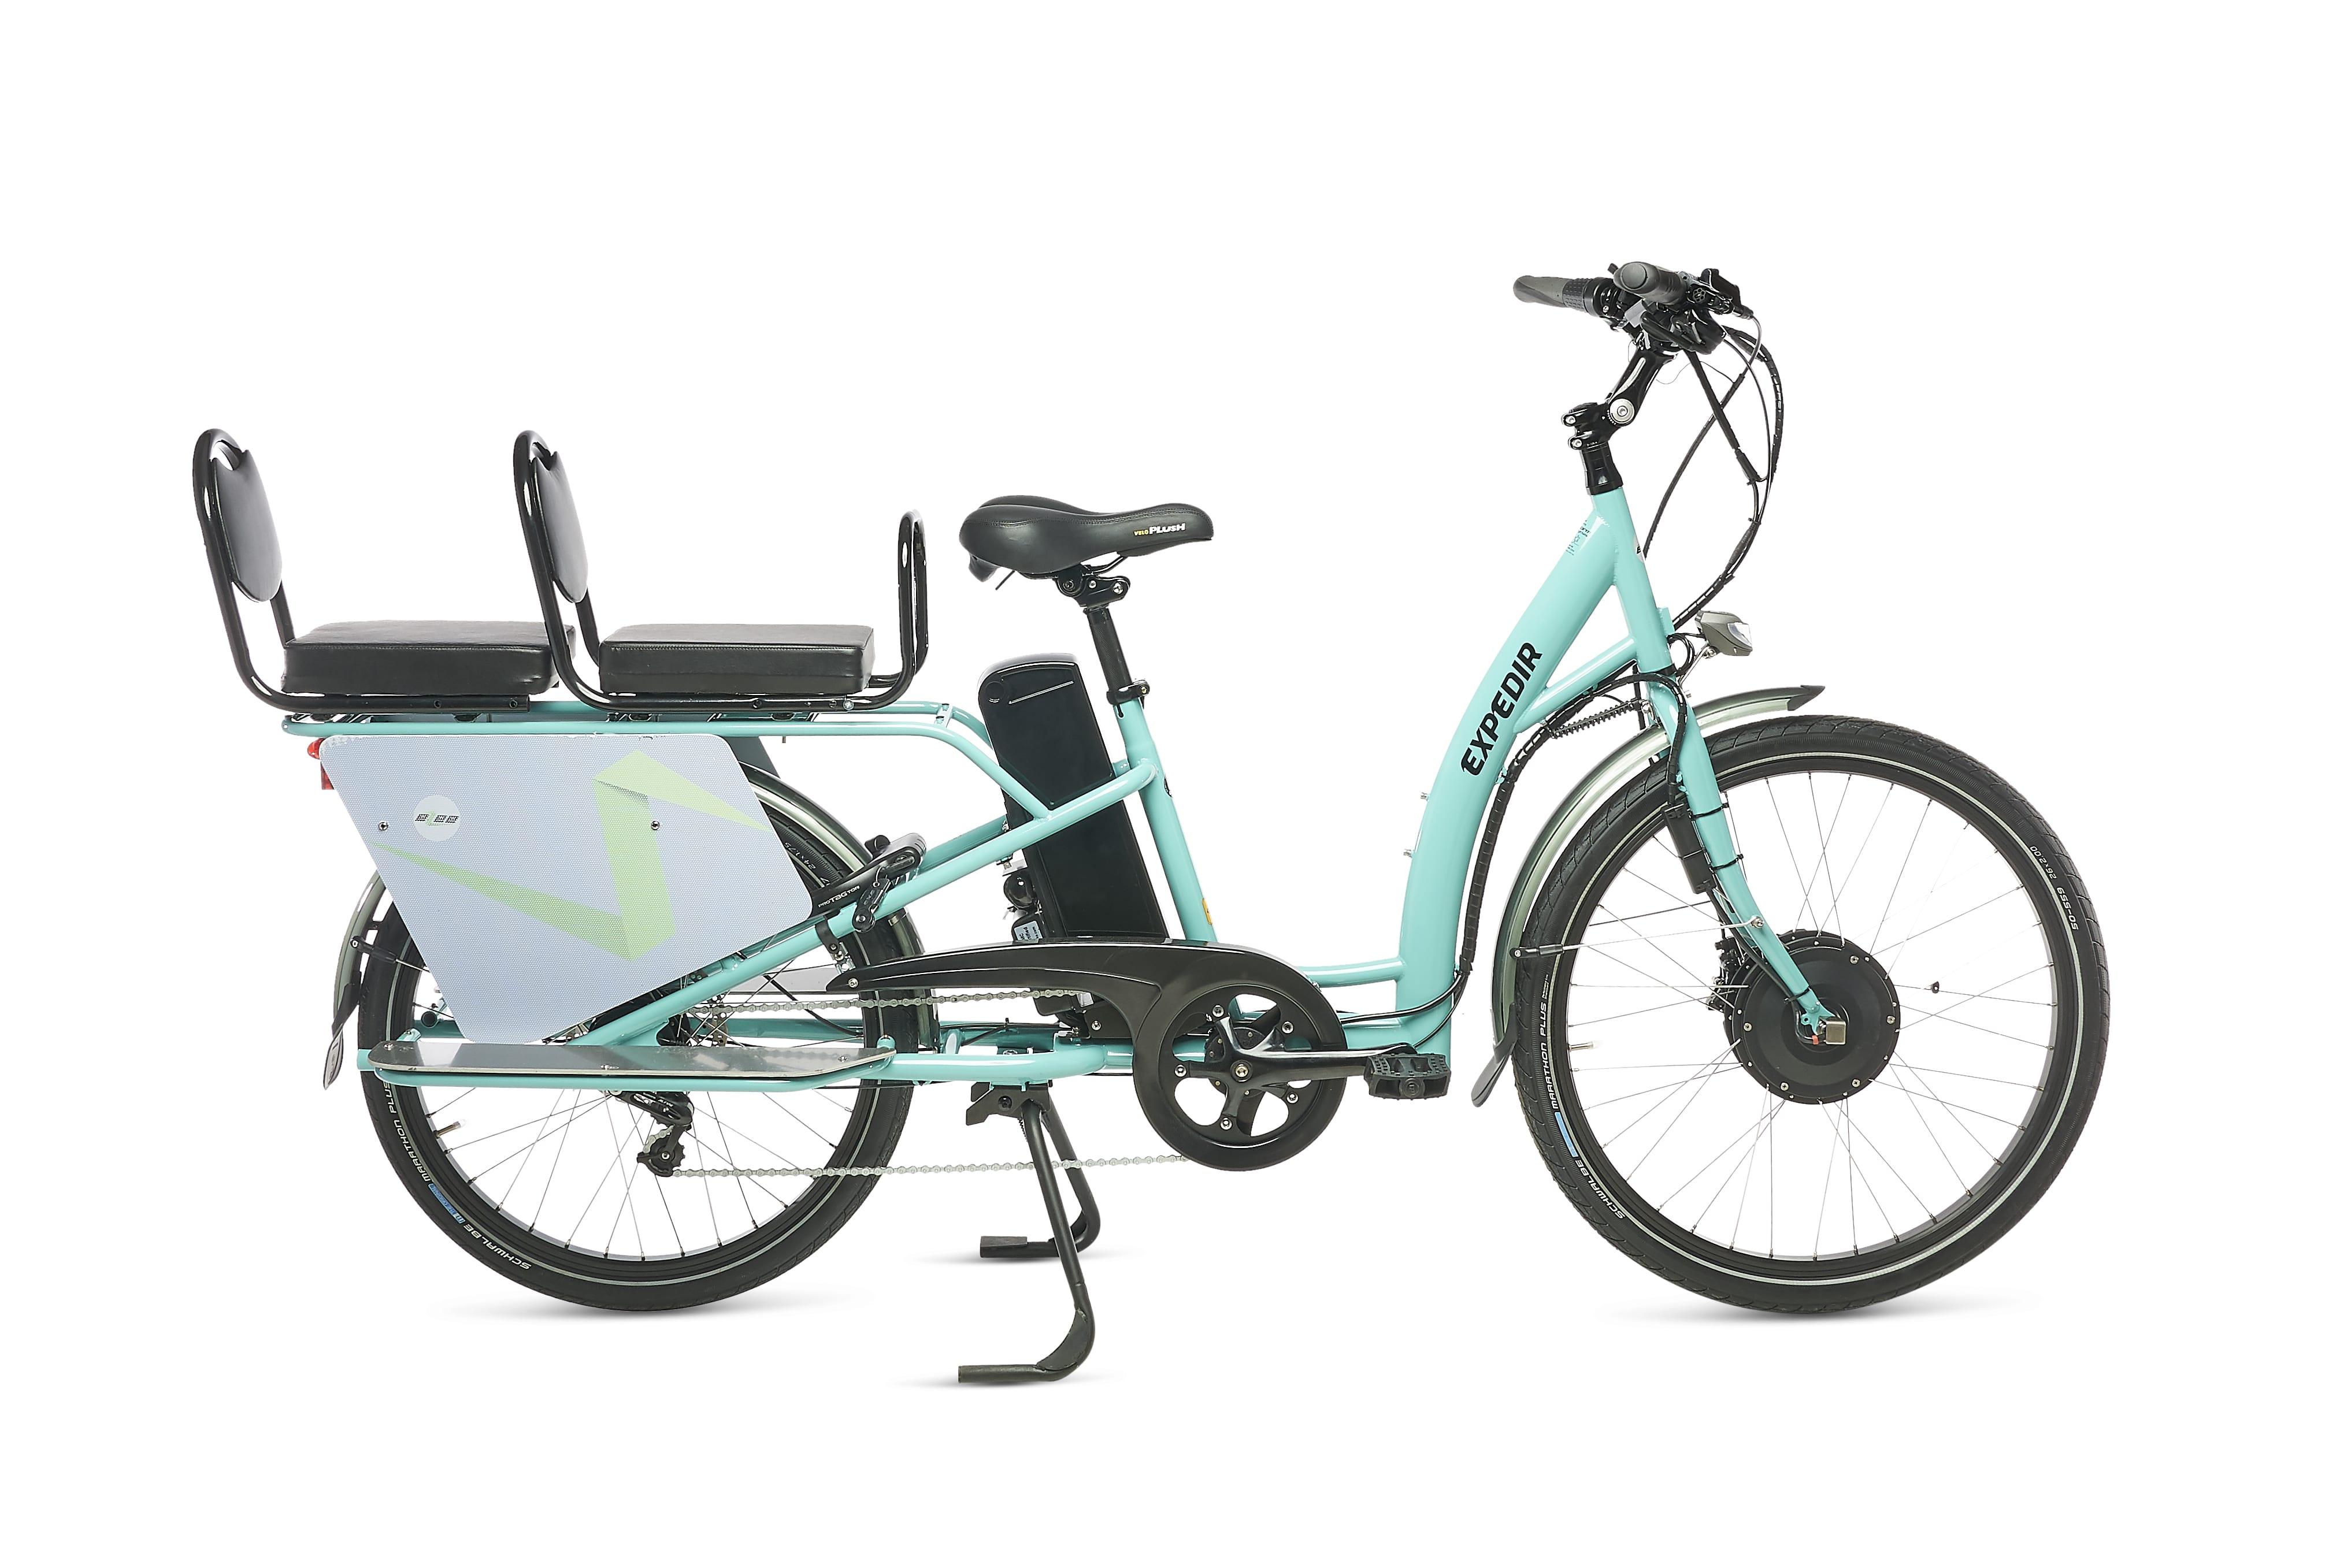 Ezee Expedir T4 19ah Electric Bike Team